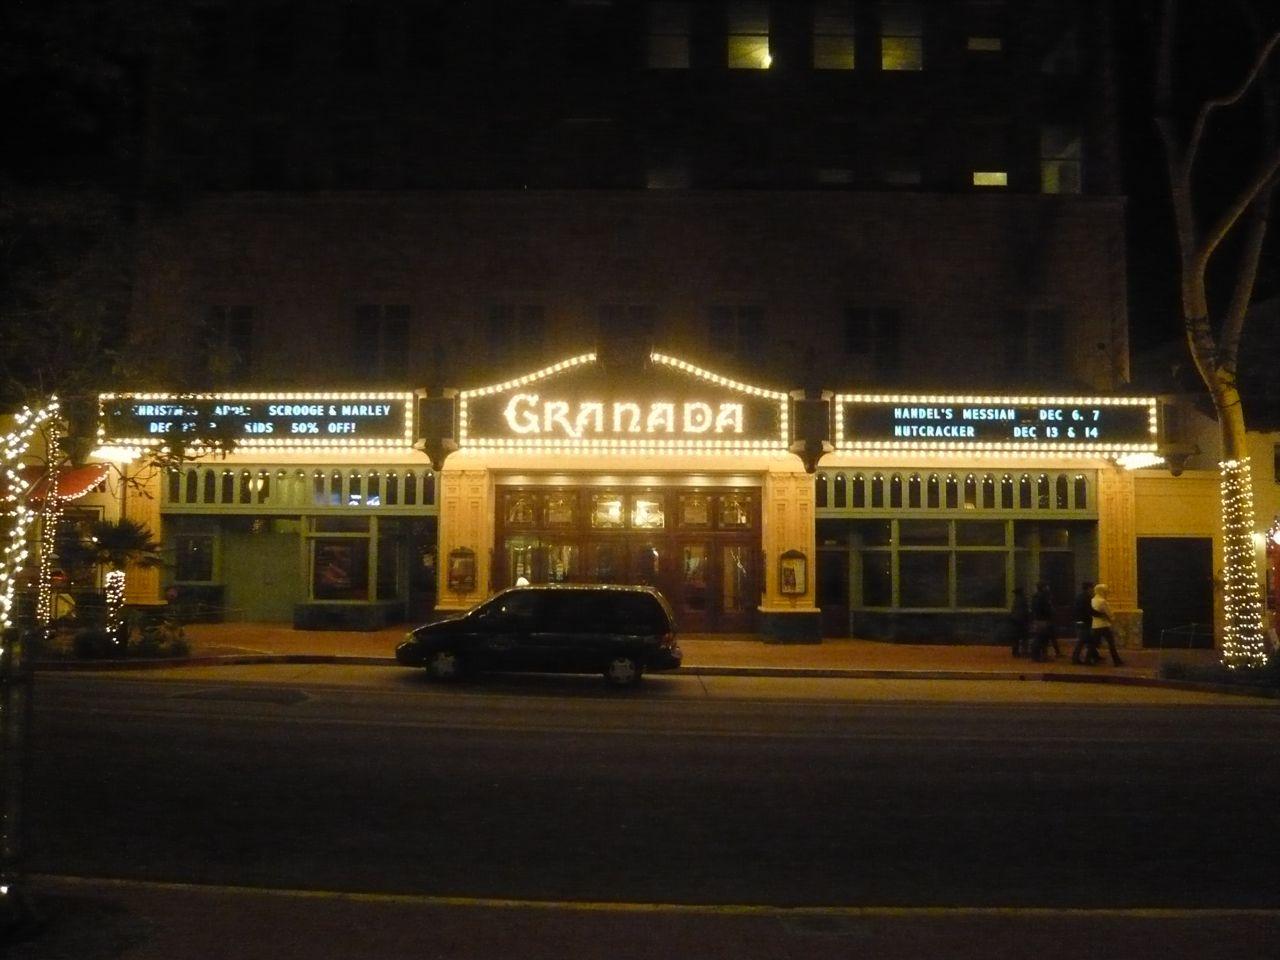 Granada theater Santa Barbara Dec 4, 2008 (click to enlarge)